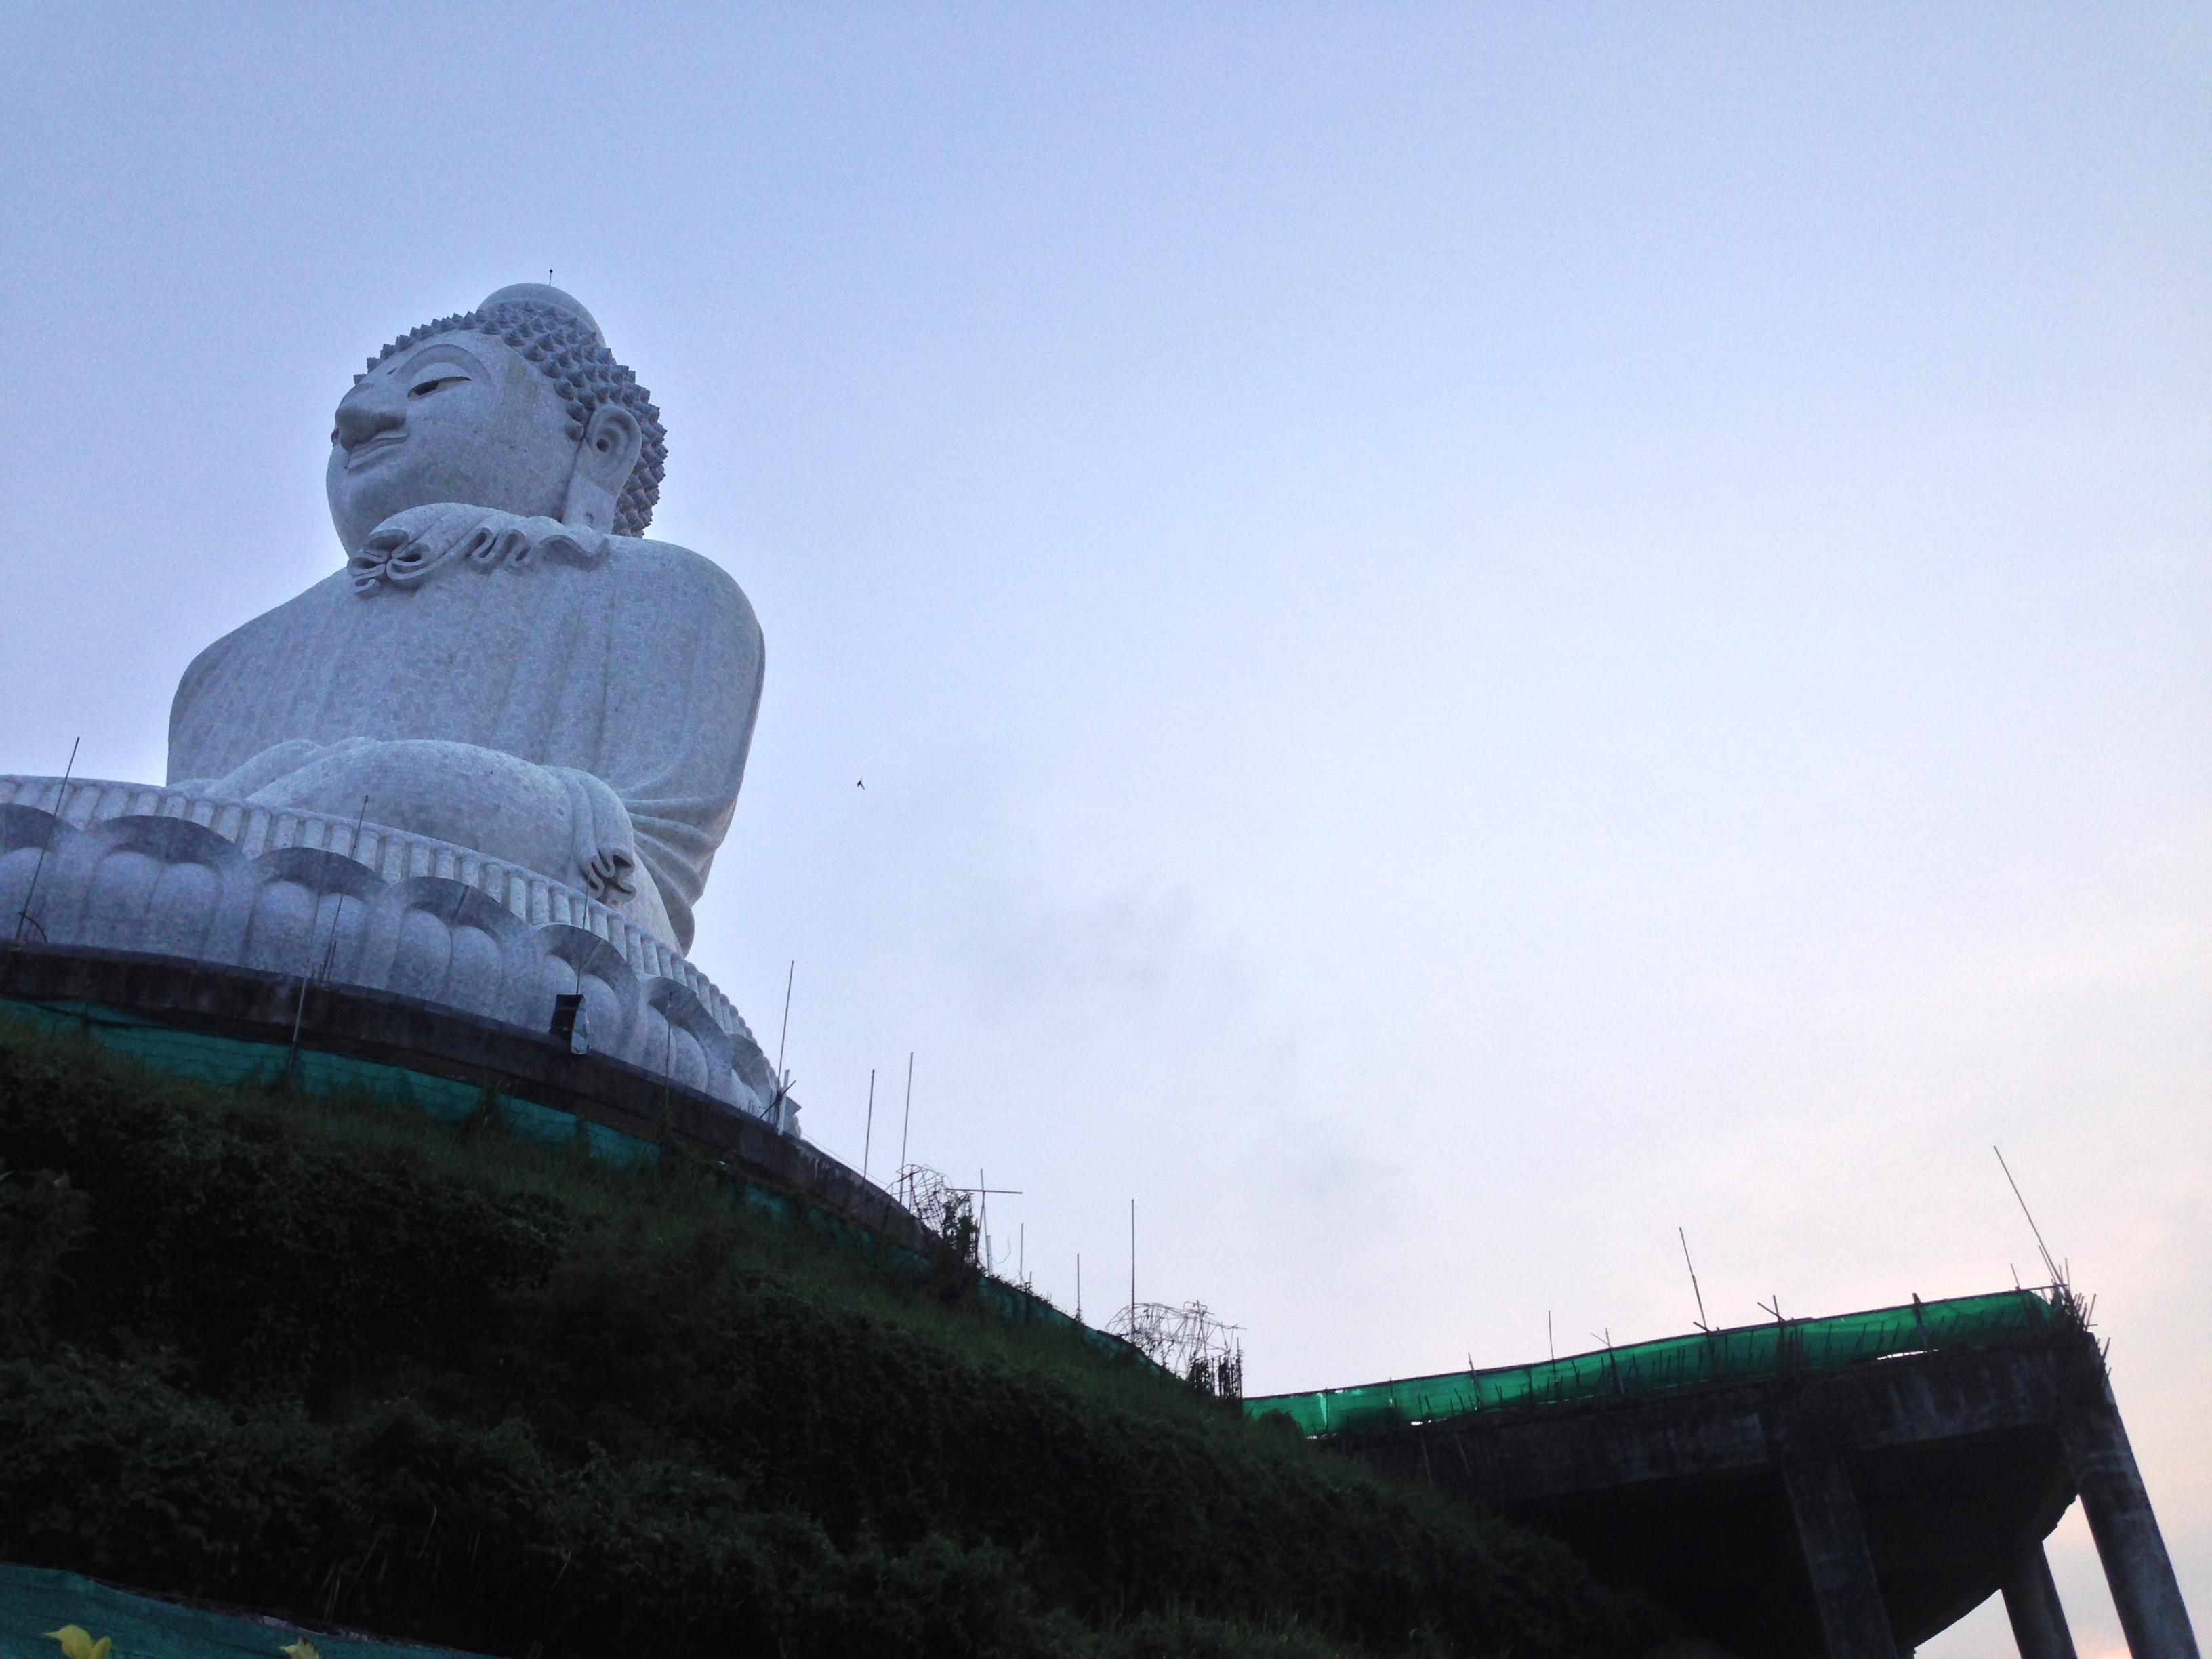 Big Buddha viewed from below